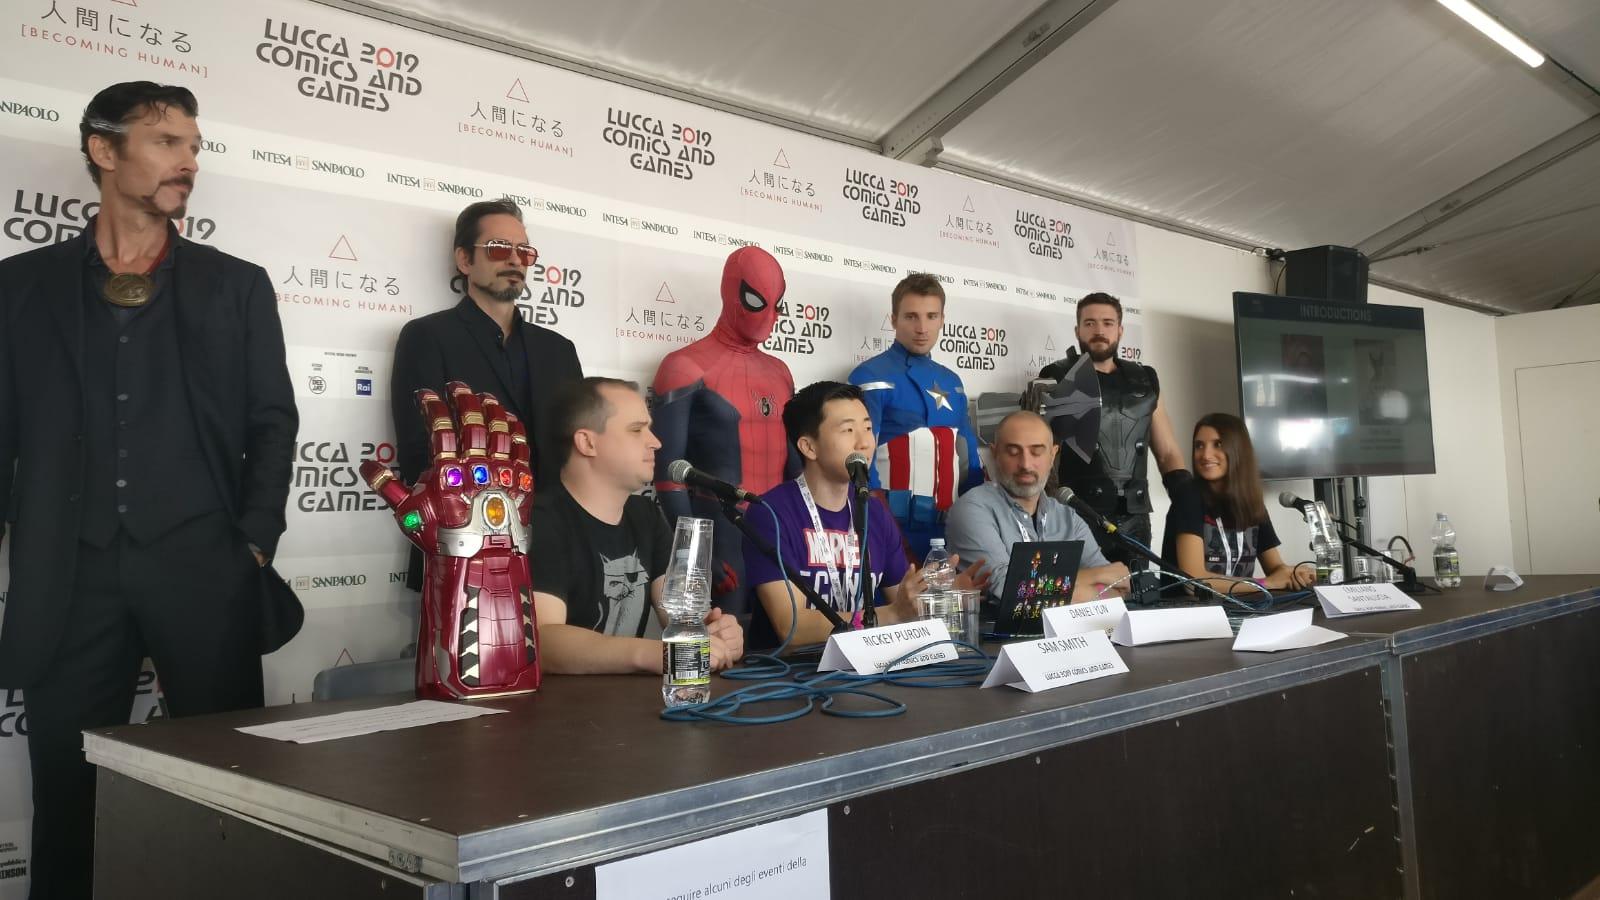 marvel-star-wars-hasbro-reveal-lucca-comics-games-2019